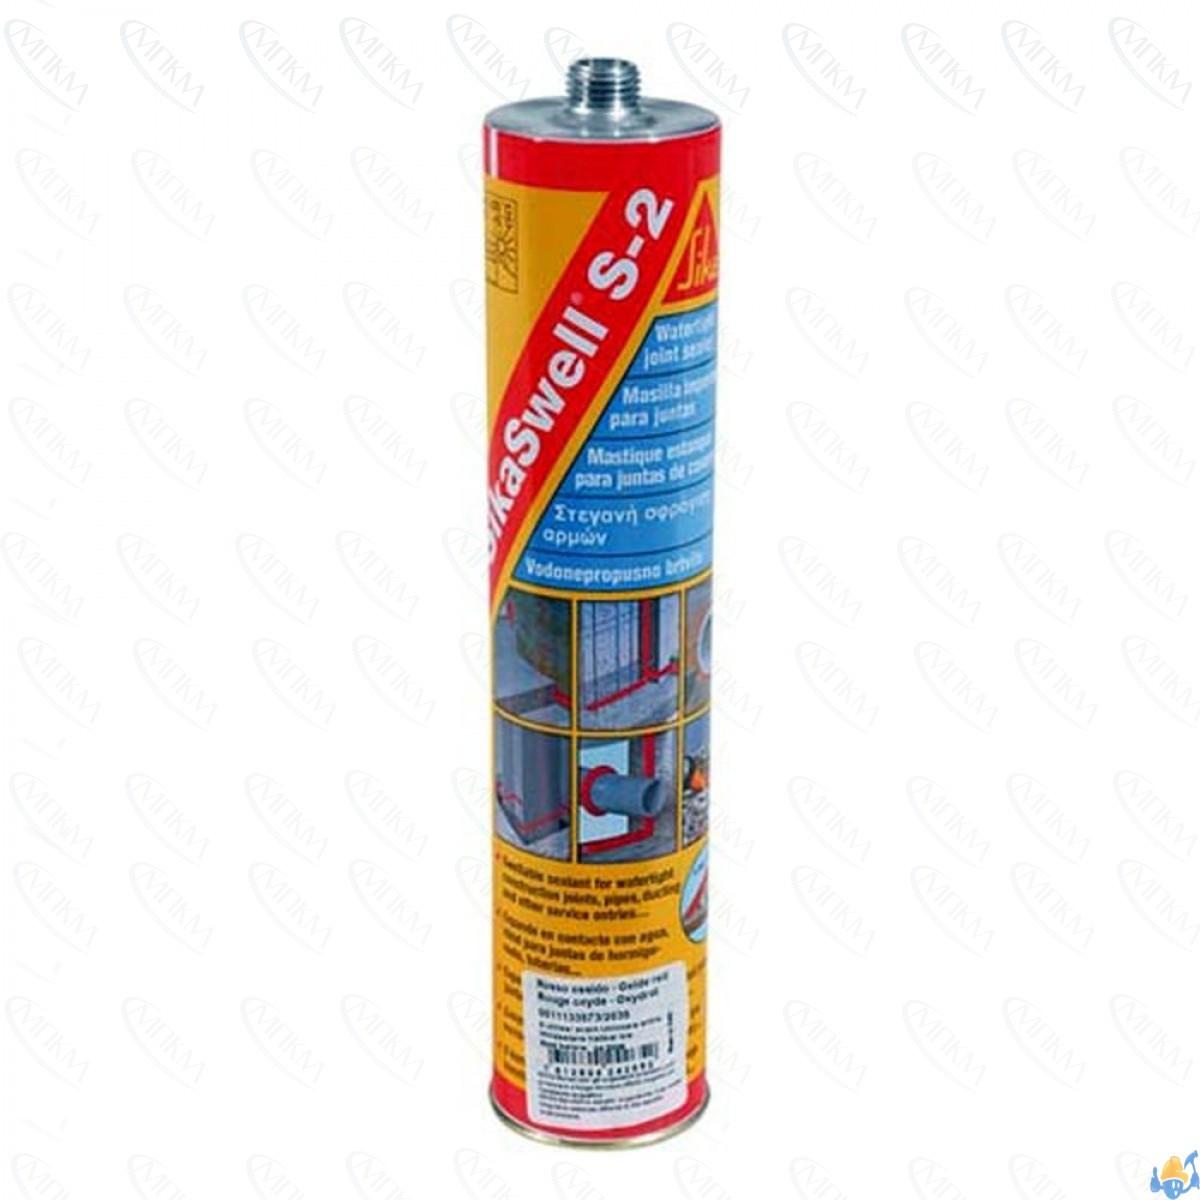 Герметик полиуретановый sika swell s 2 купить промышленная гидроизоляция краснодар дризоро